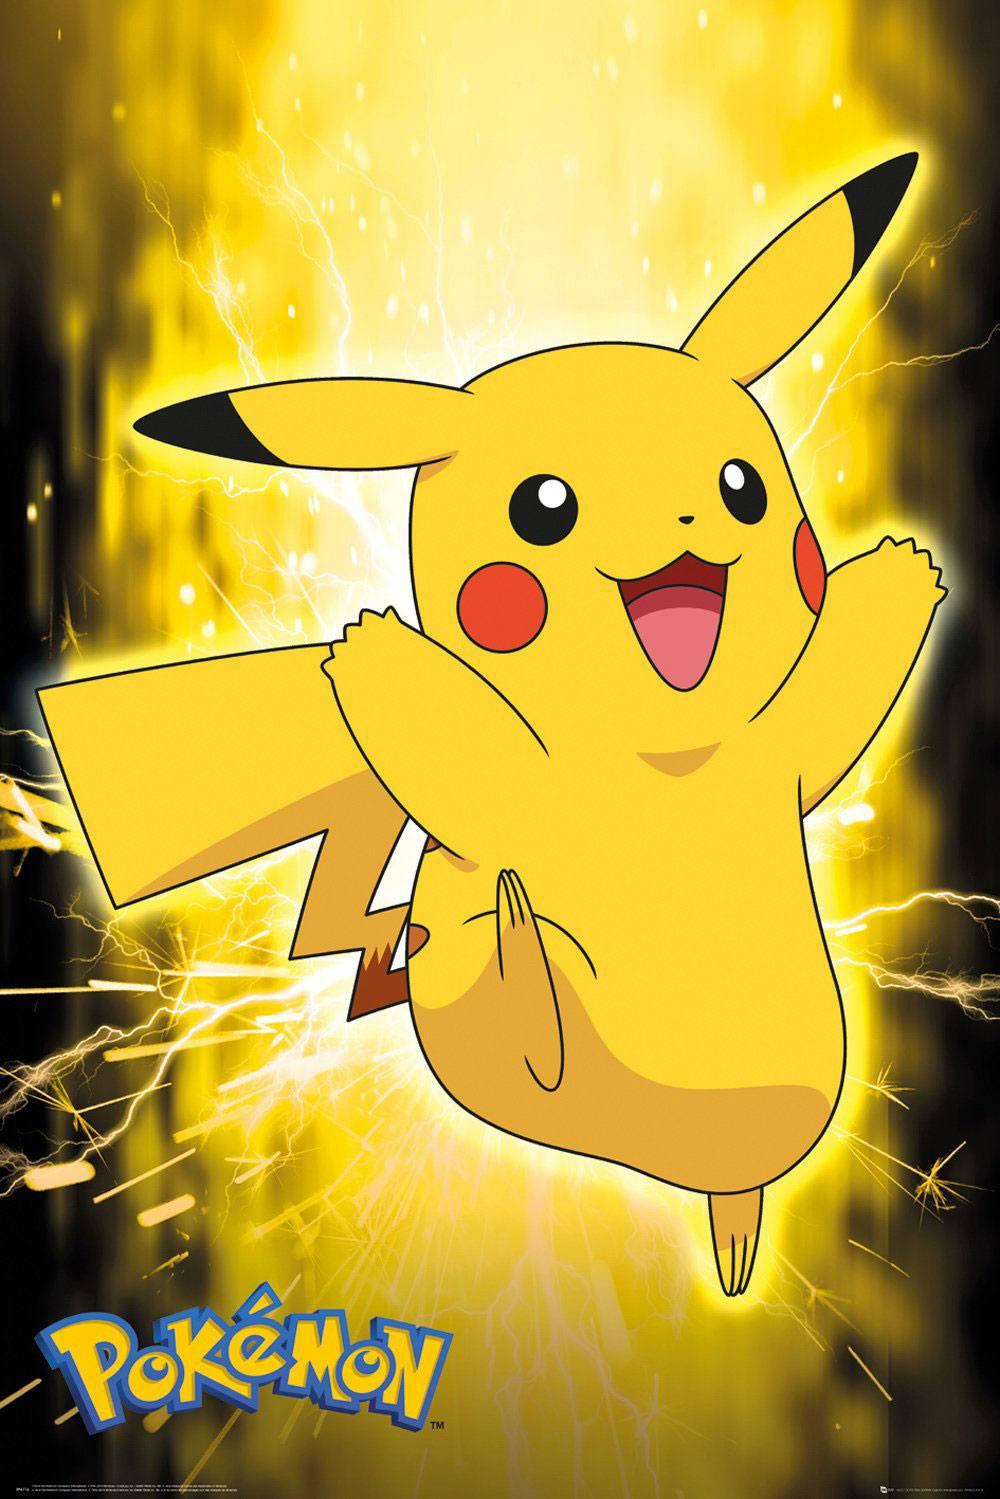 Pokémon Poster Pack Pikachu Neon 61 x 91 cm (5)